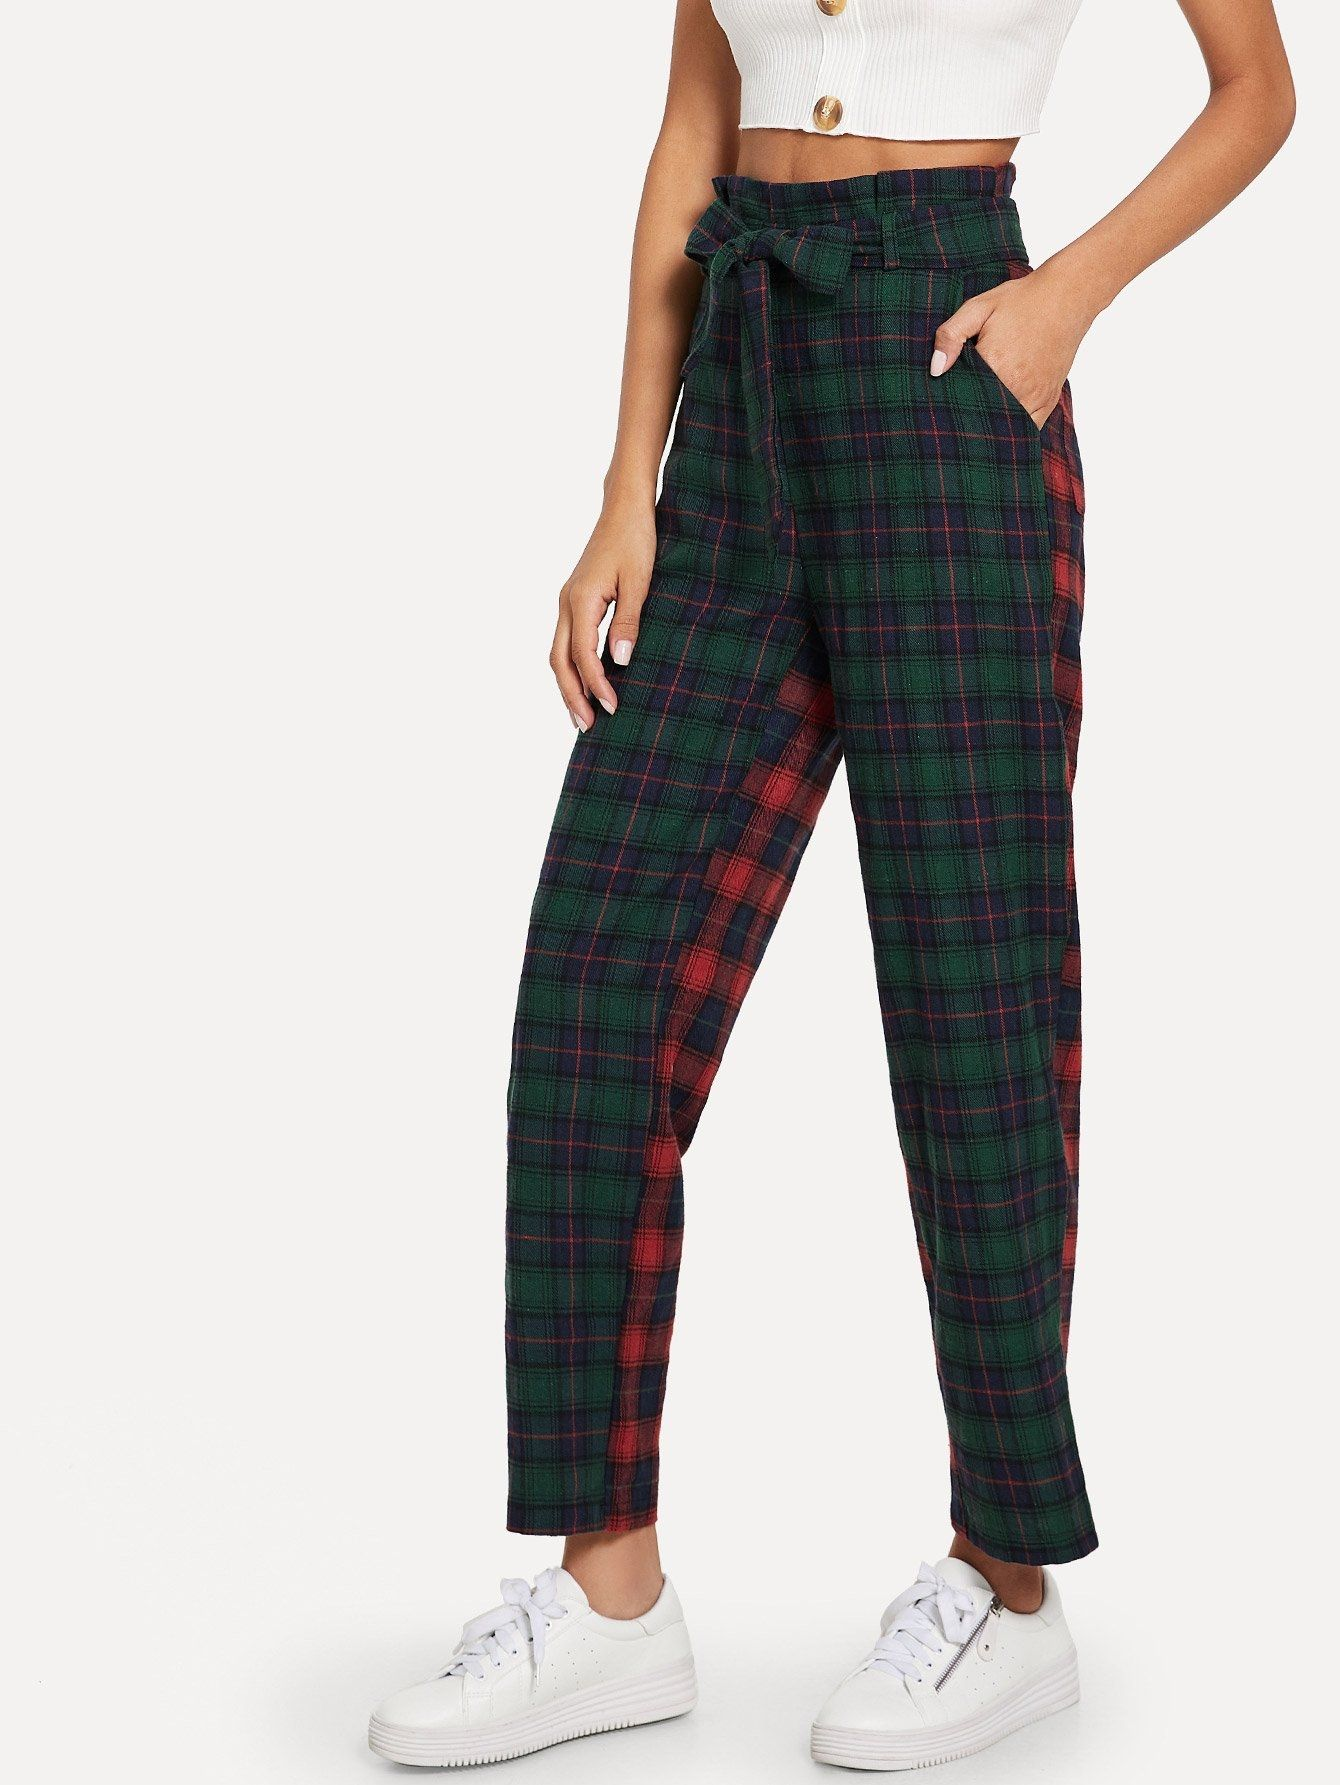 db361917ef35 SHEIN Plaid Self Tie Waist Pants Price in Egypt | Jumia | Pants ...